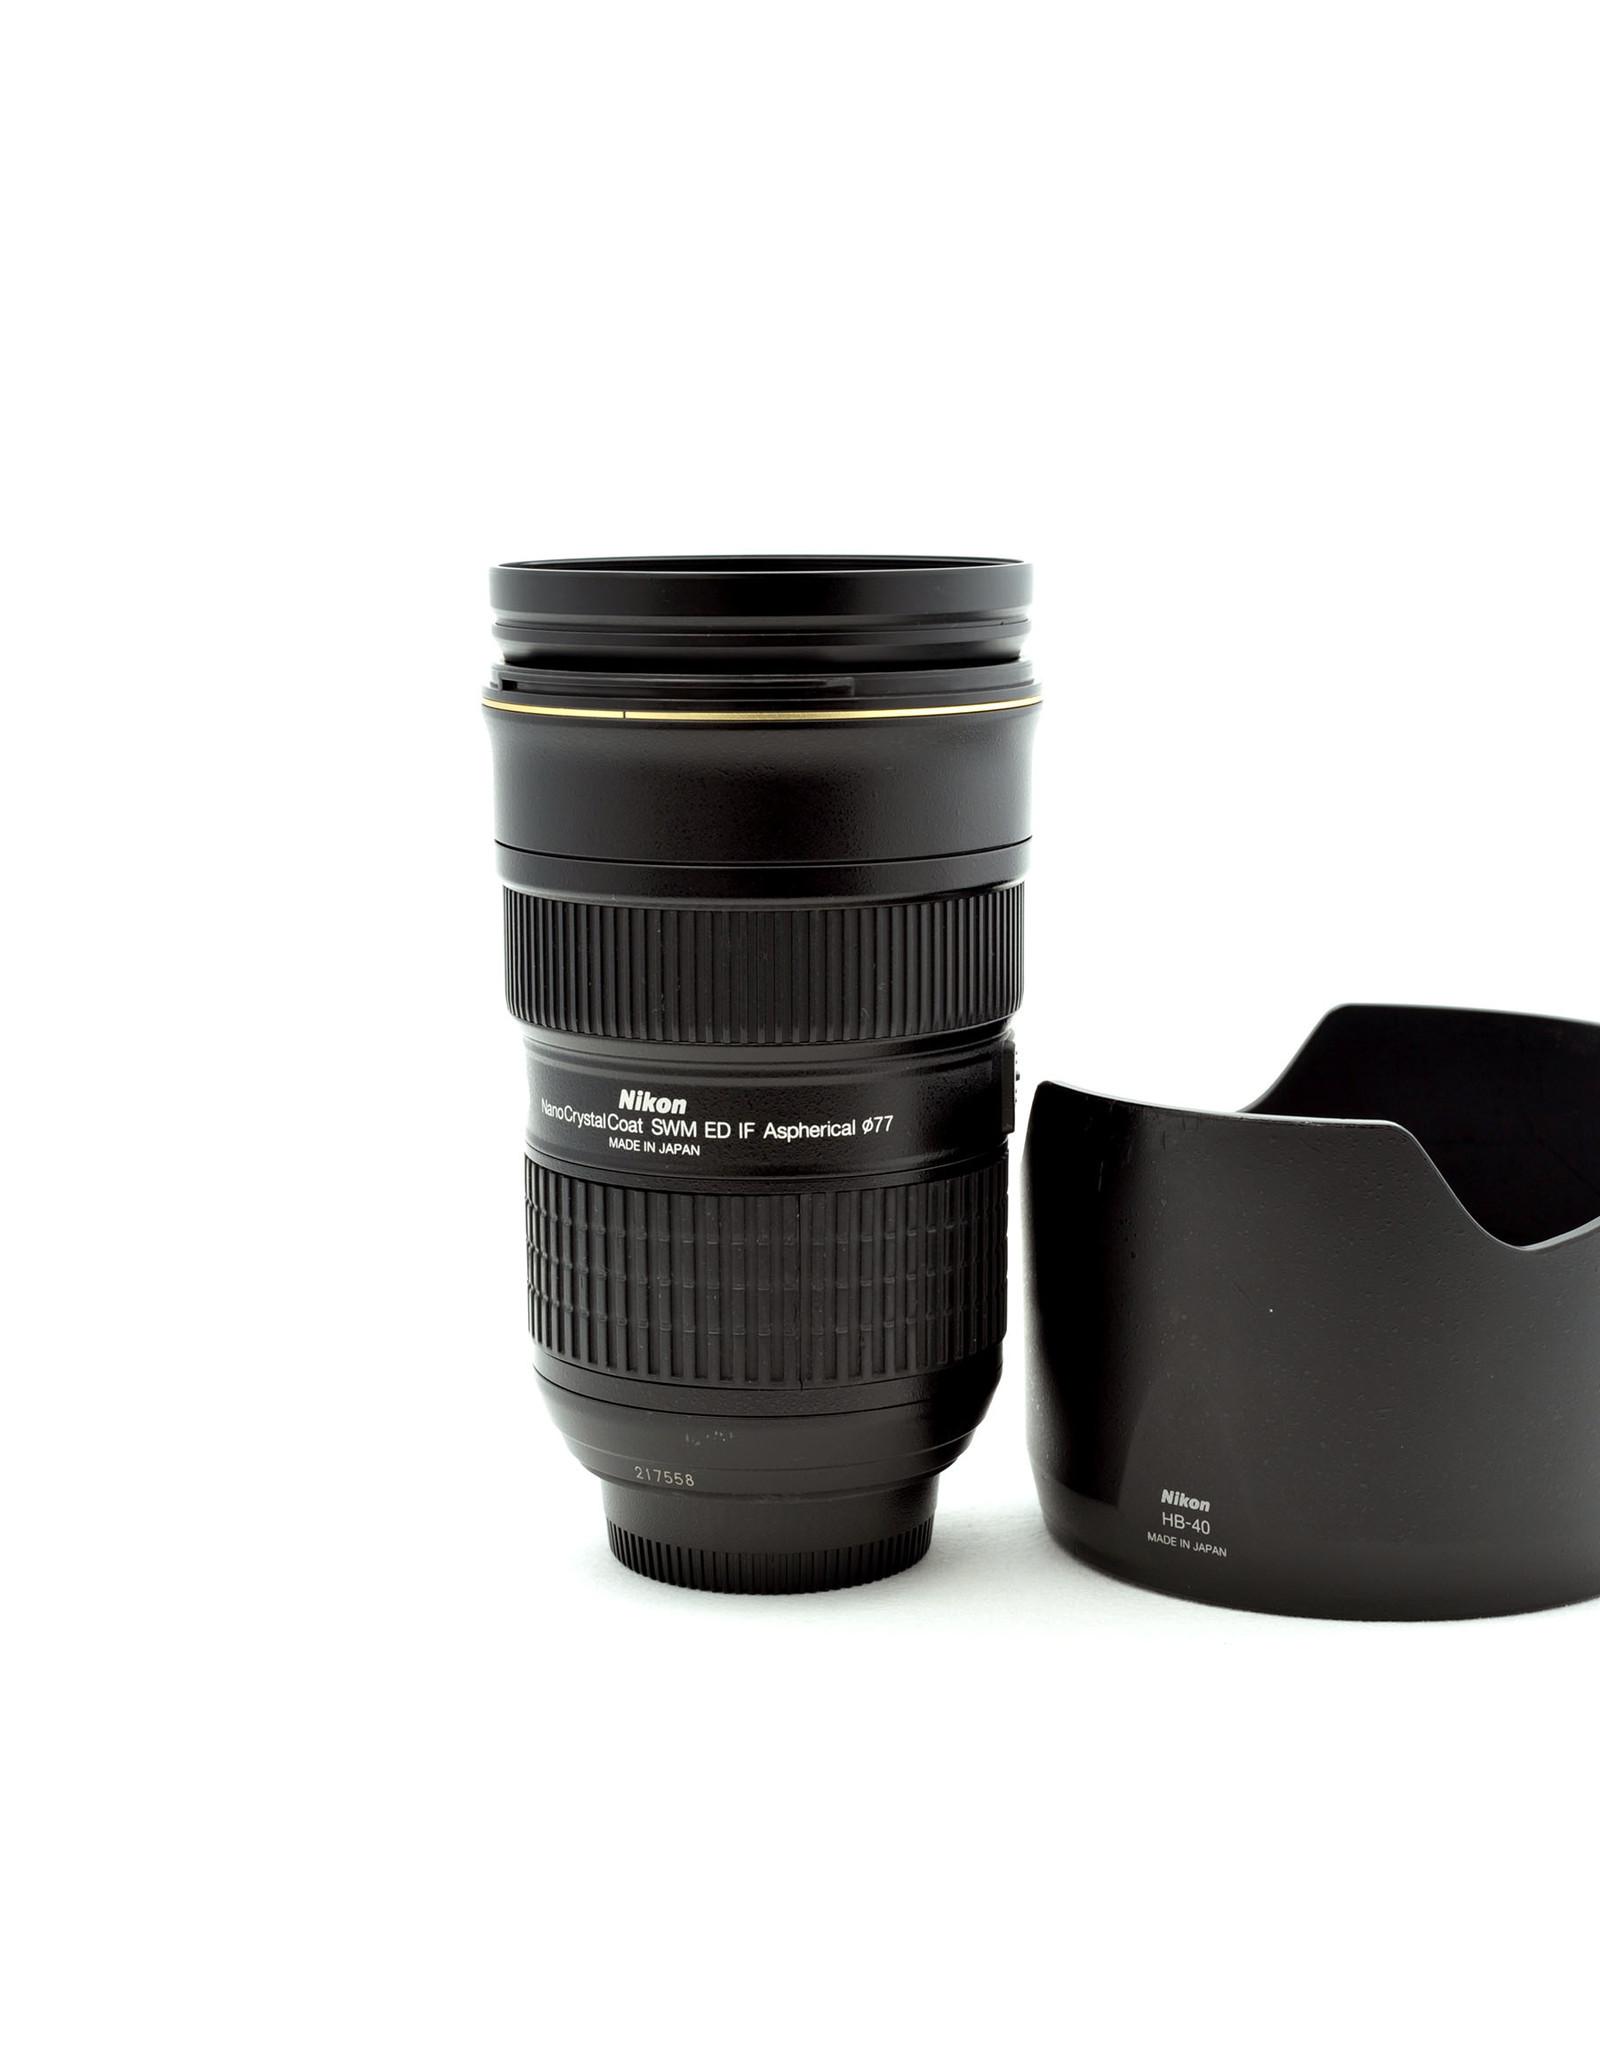 Nikon Nikon 24-70mm f2.8G AF-S  + hood